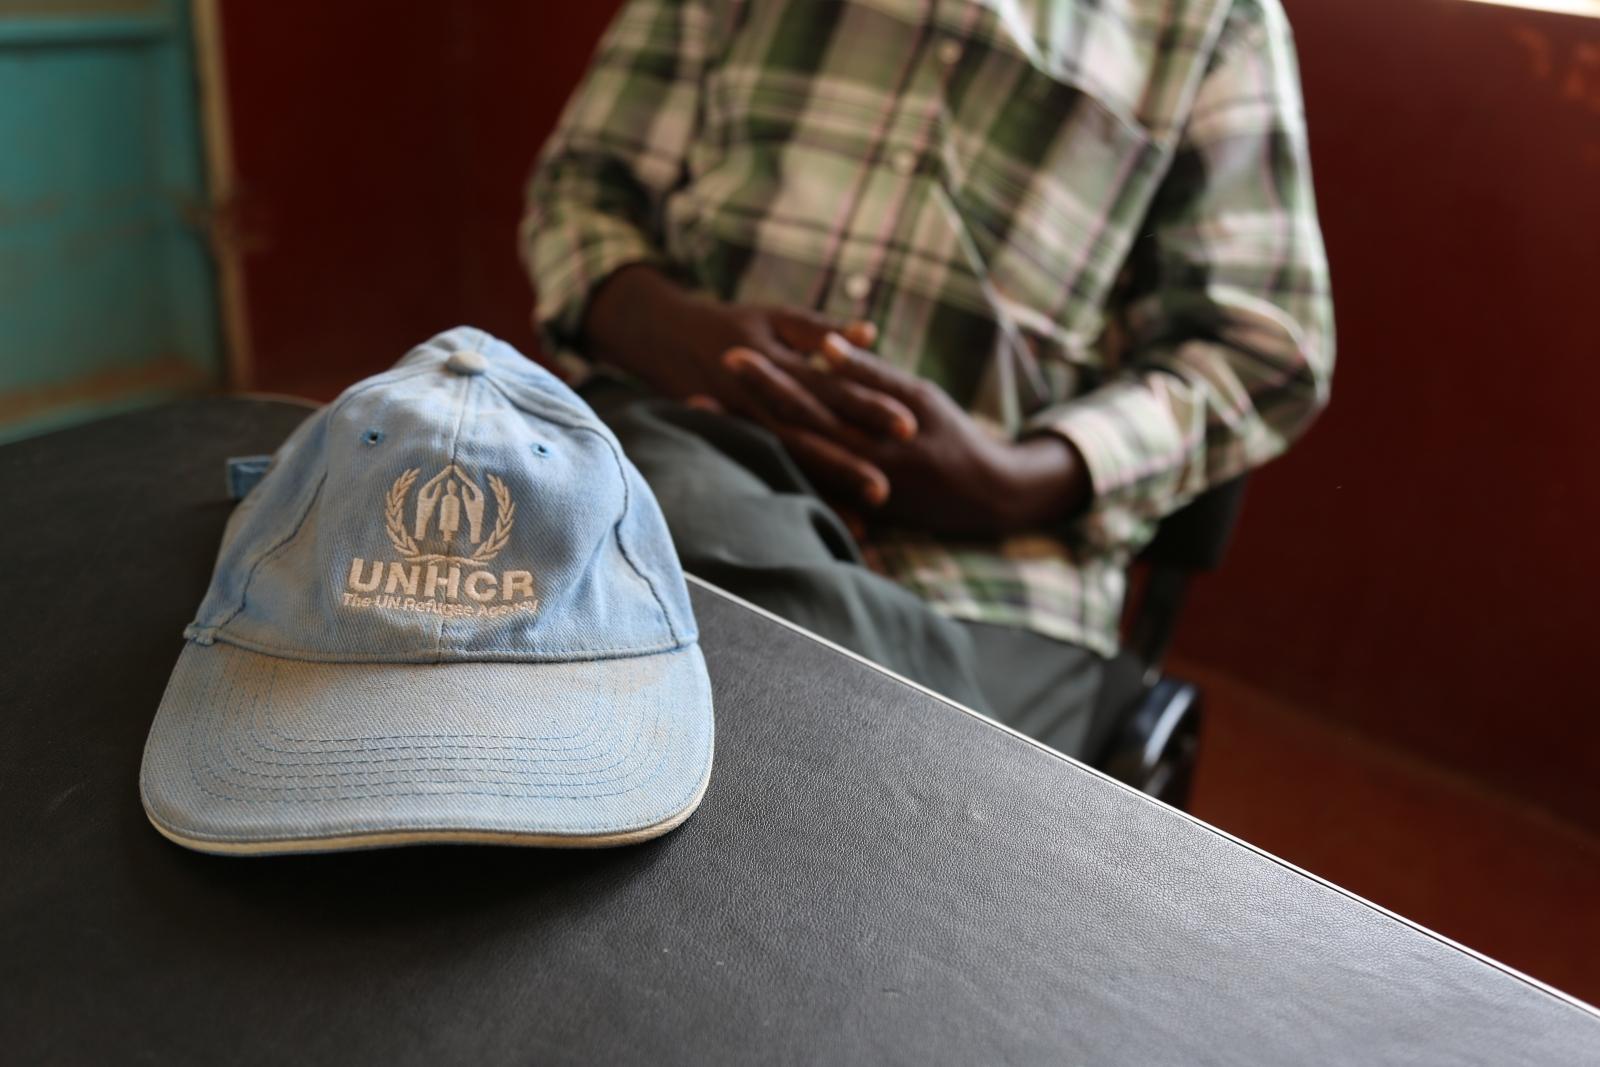 Somali father sent his daughters to Nairobi